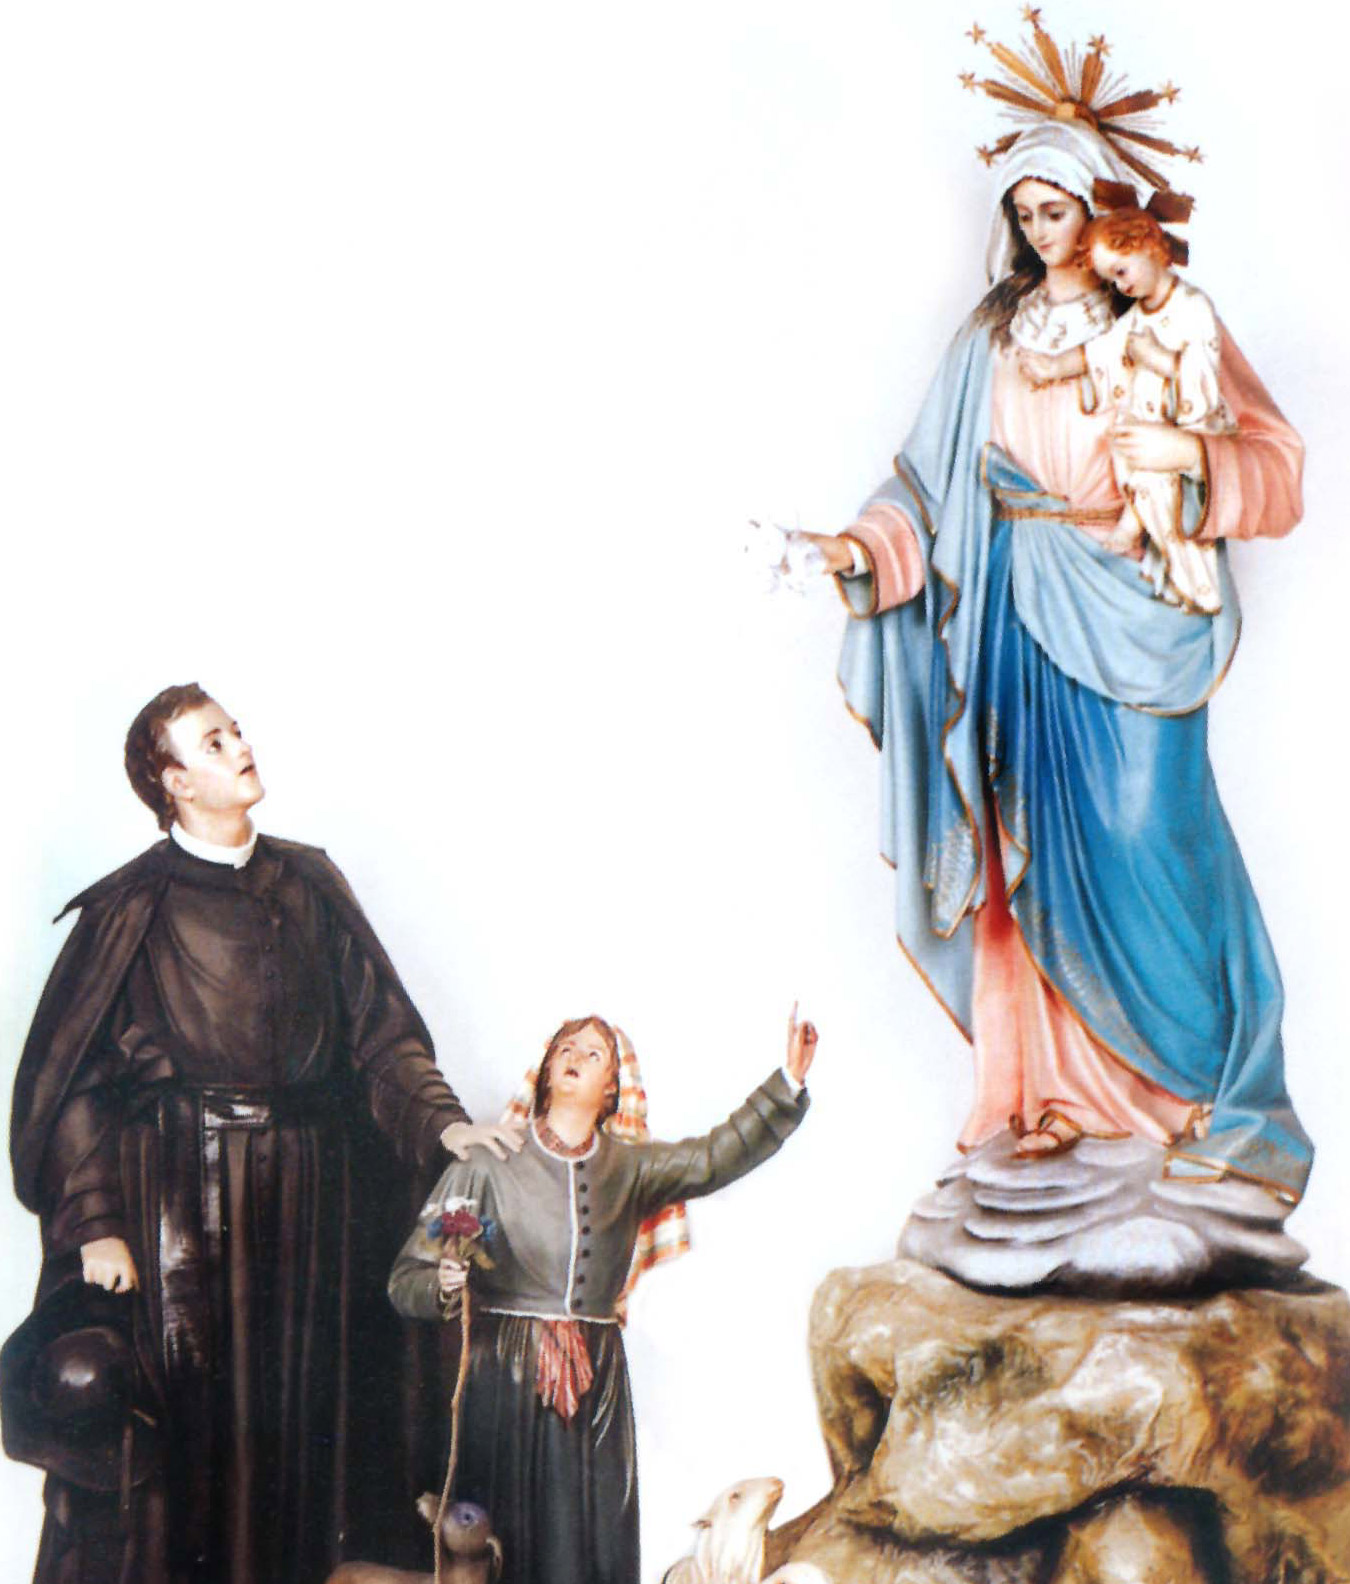 http://www.ilgallo.it/wp-content/uploads/2010/06/statua_madonna_coelimanna1.jpg